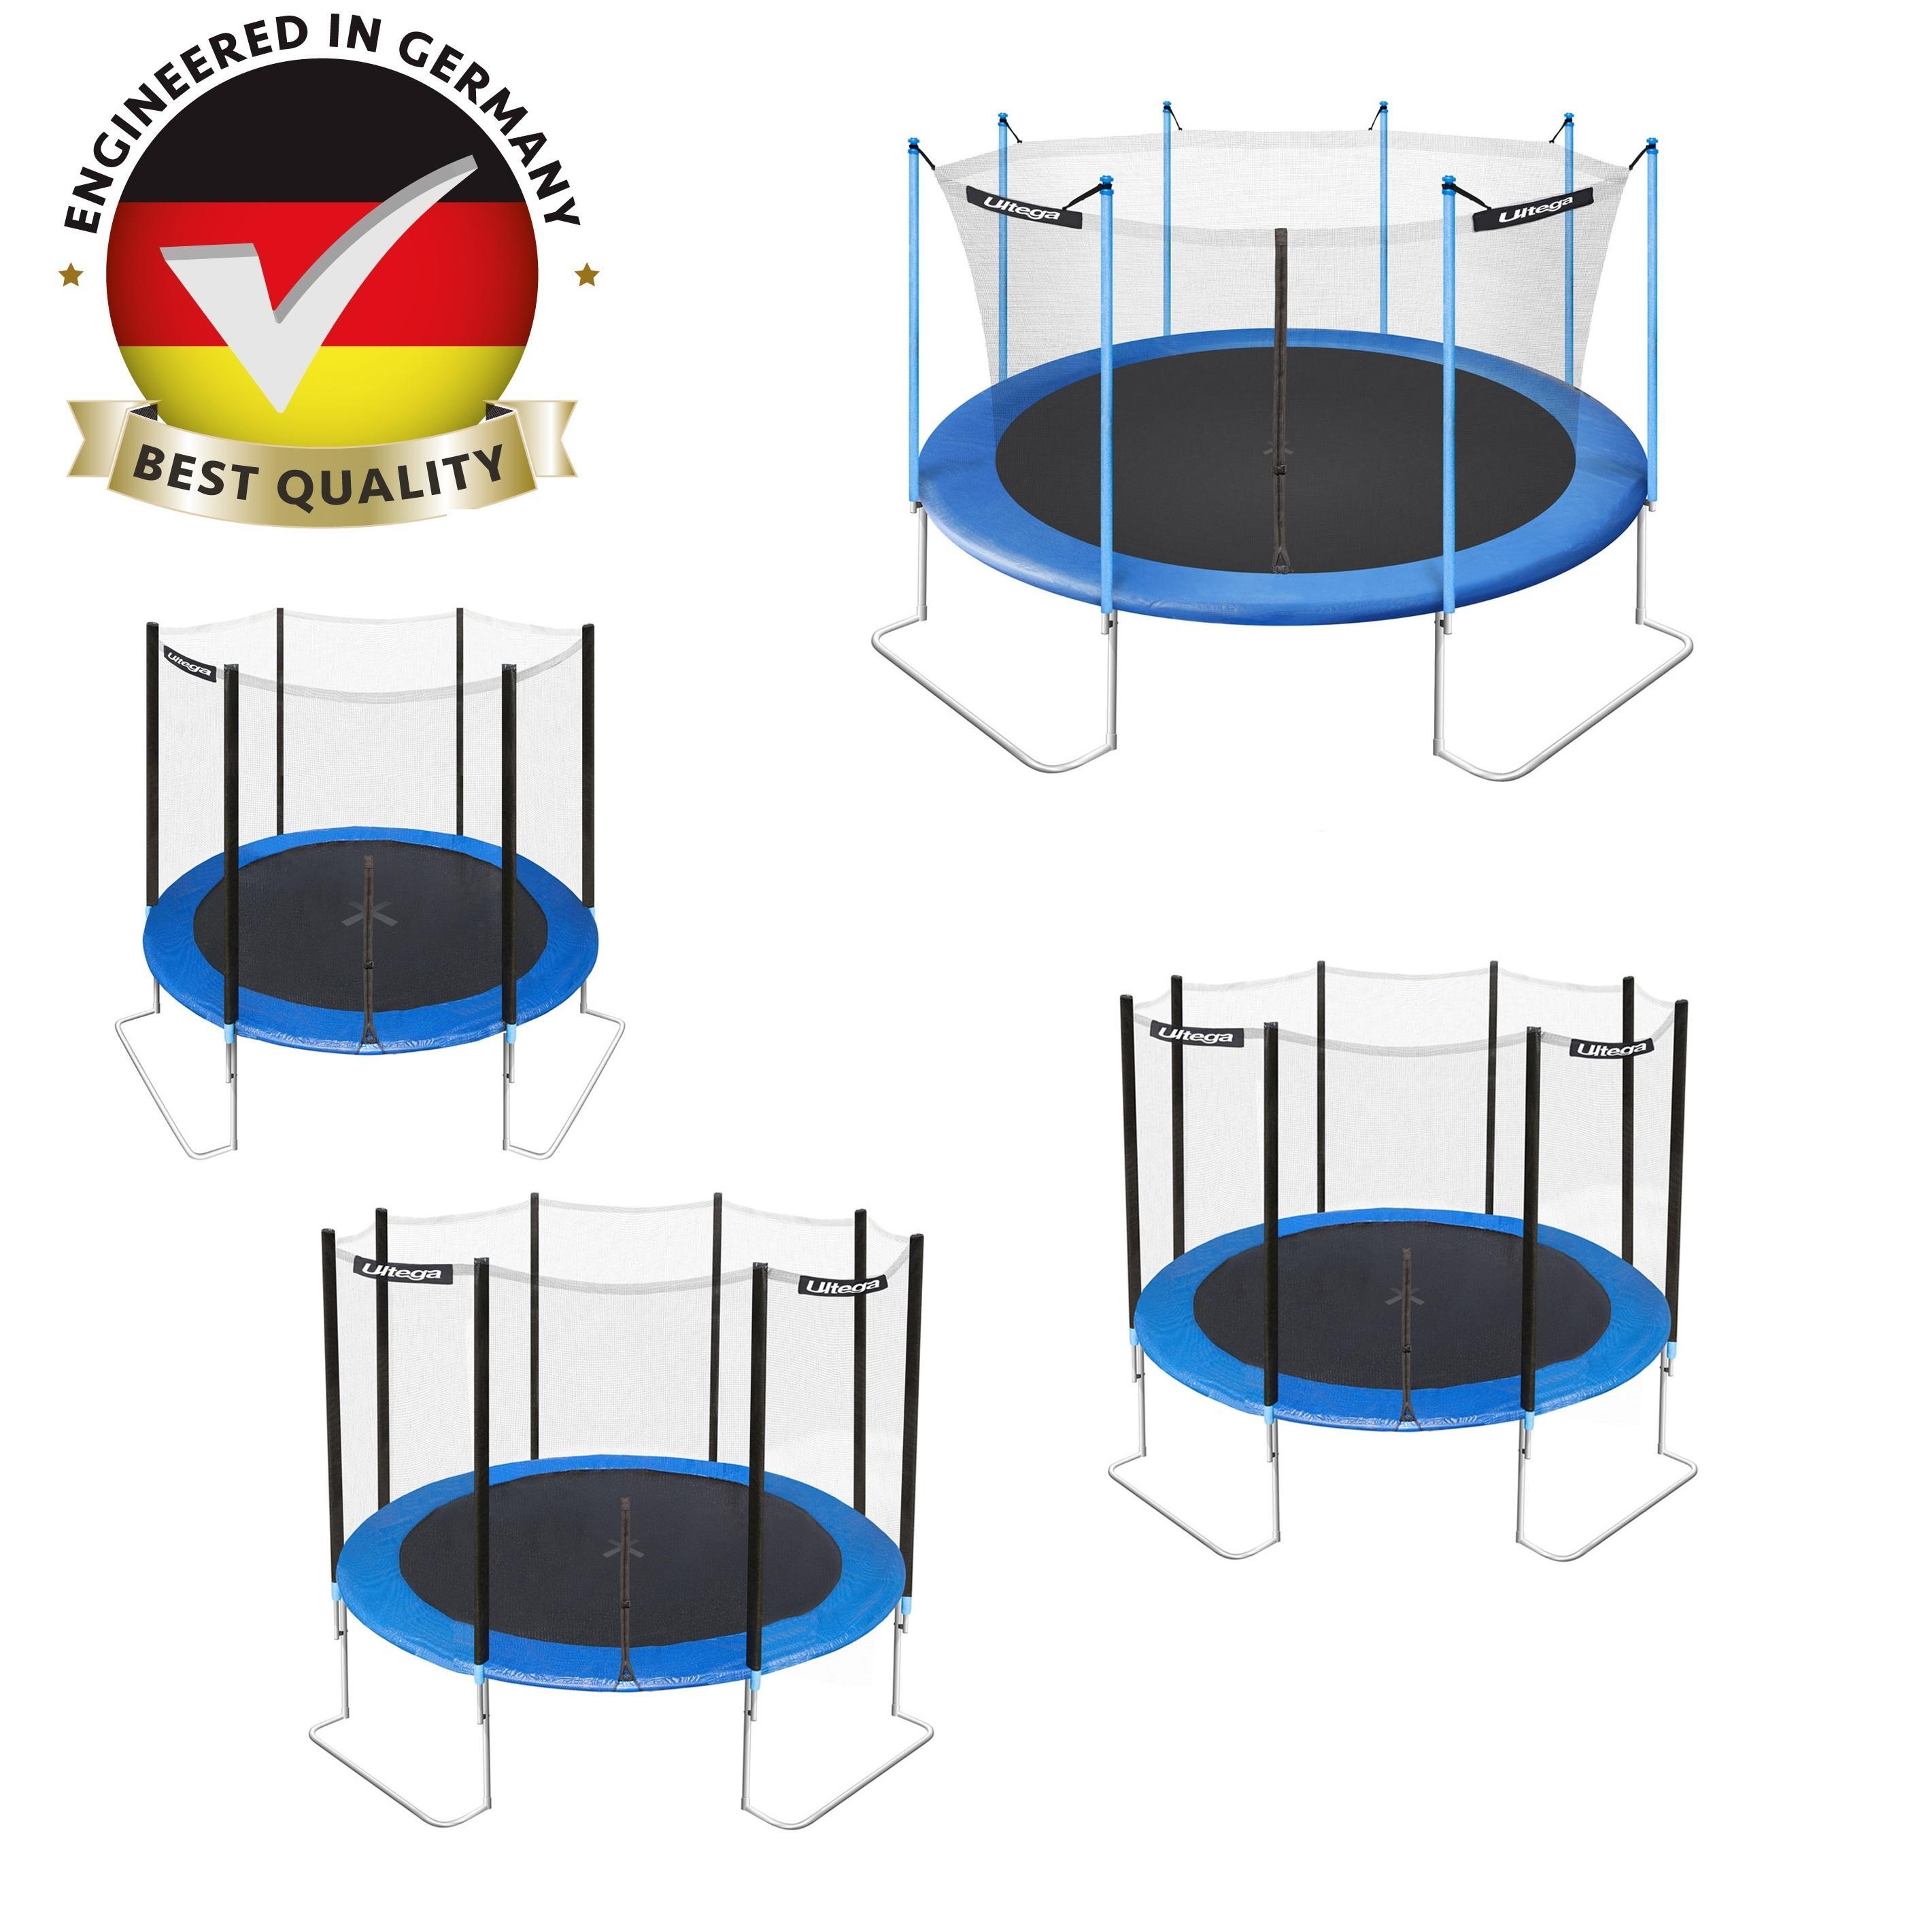 Trampoline Parts Jumptek: Amazon.com : Ultega Jumper Trampoline With Safety Net, 10